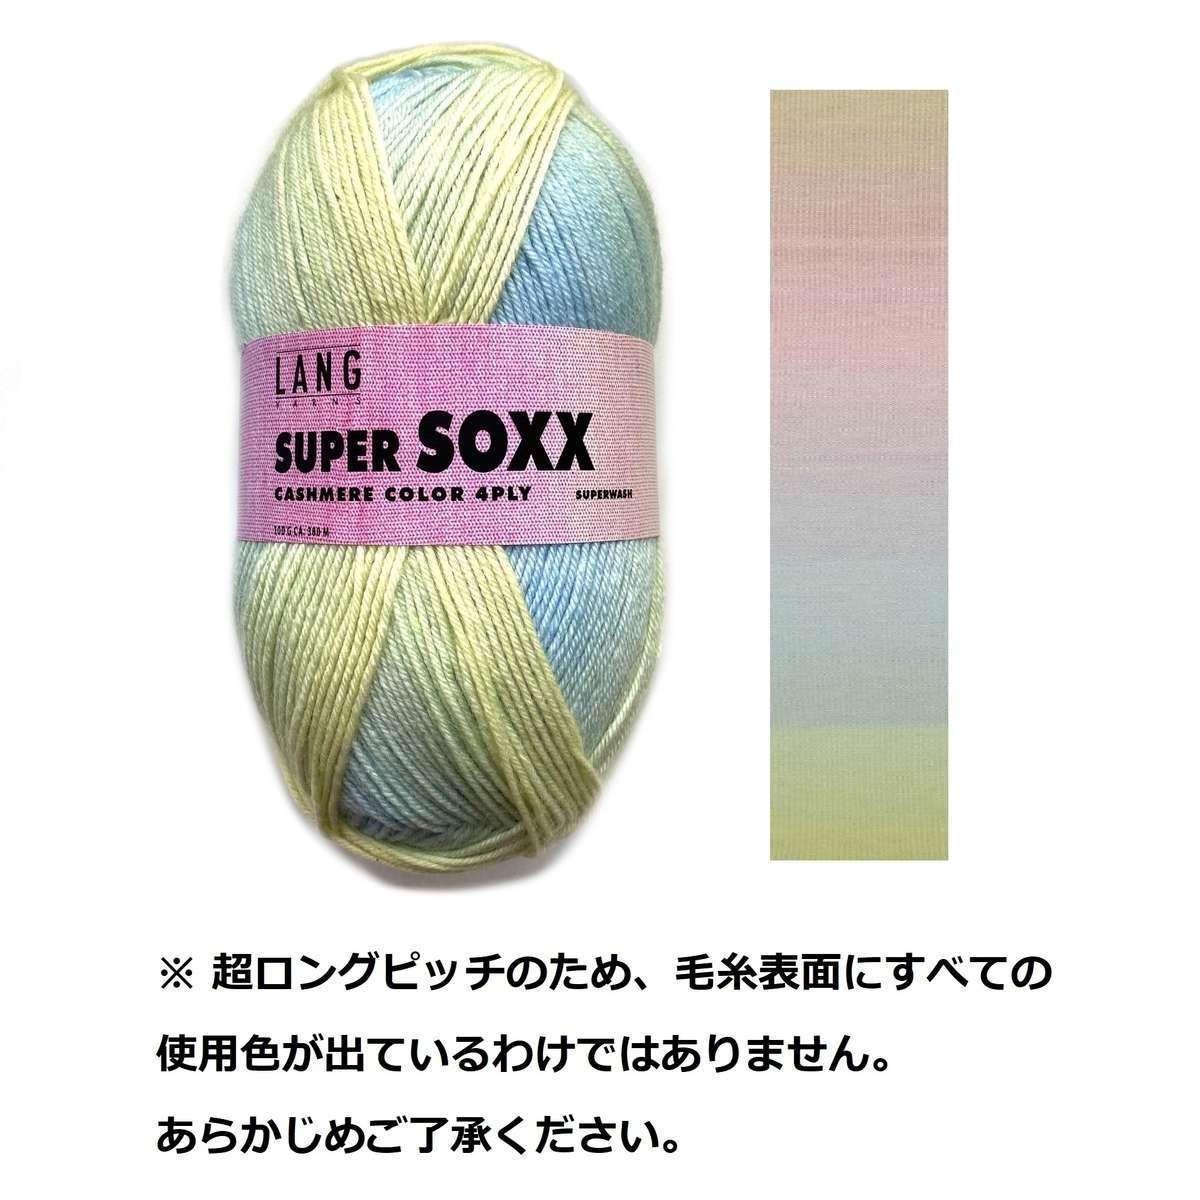 Katia ソムニウム 304 グレー・レッド